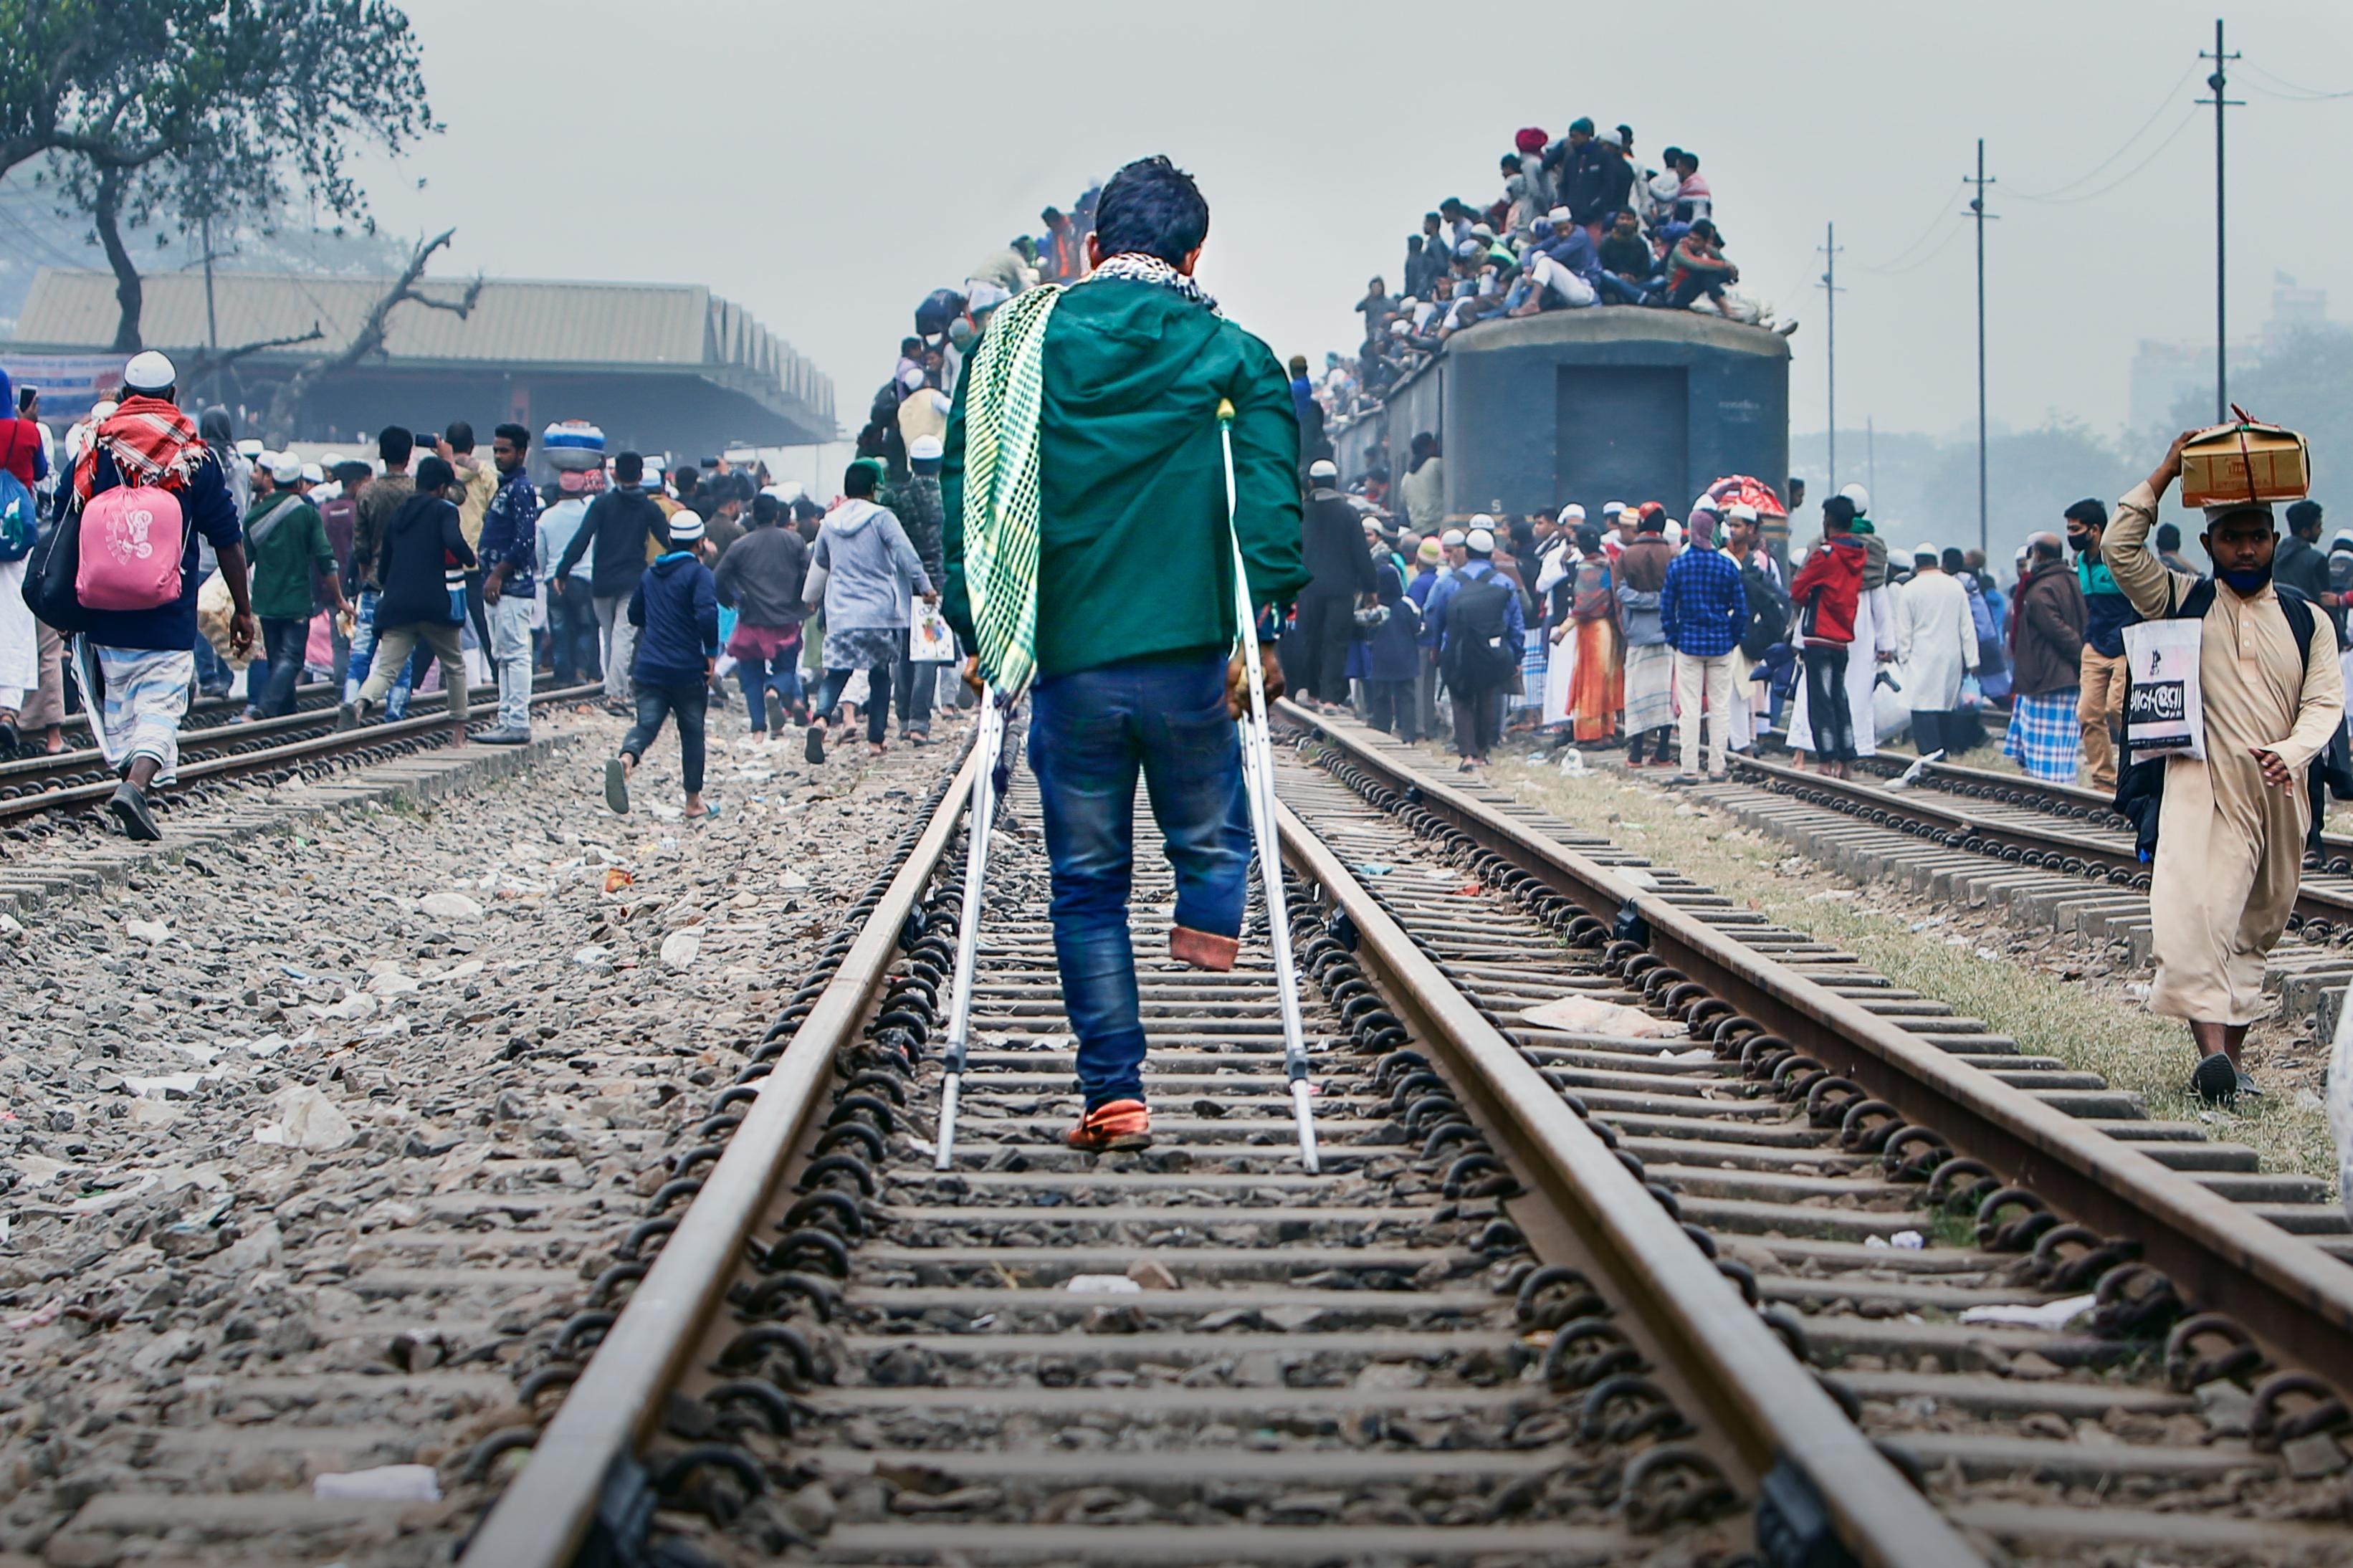 hk_c_11、戴安娜  2020年 孟加拉國 全世界穆斯林宣教大會 結束后,在人群如蟻的車陣人潮中,主人公將如何擠上回家的路呢?.jpg